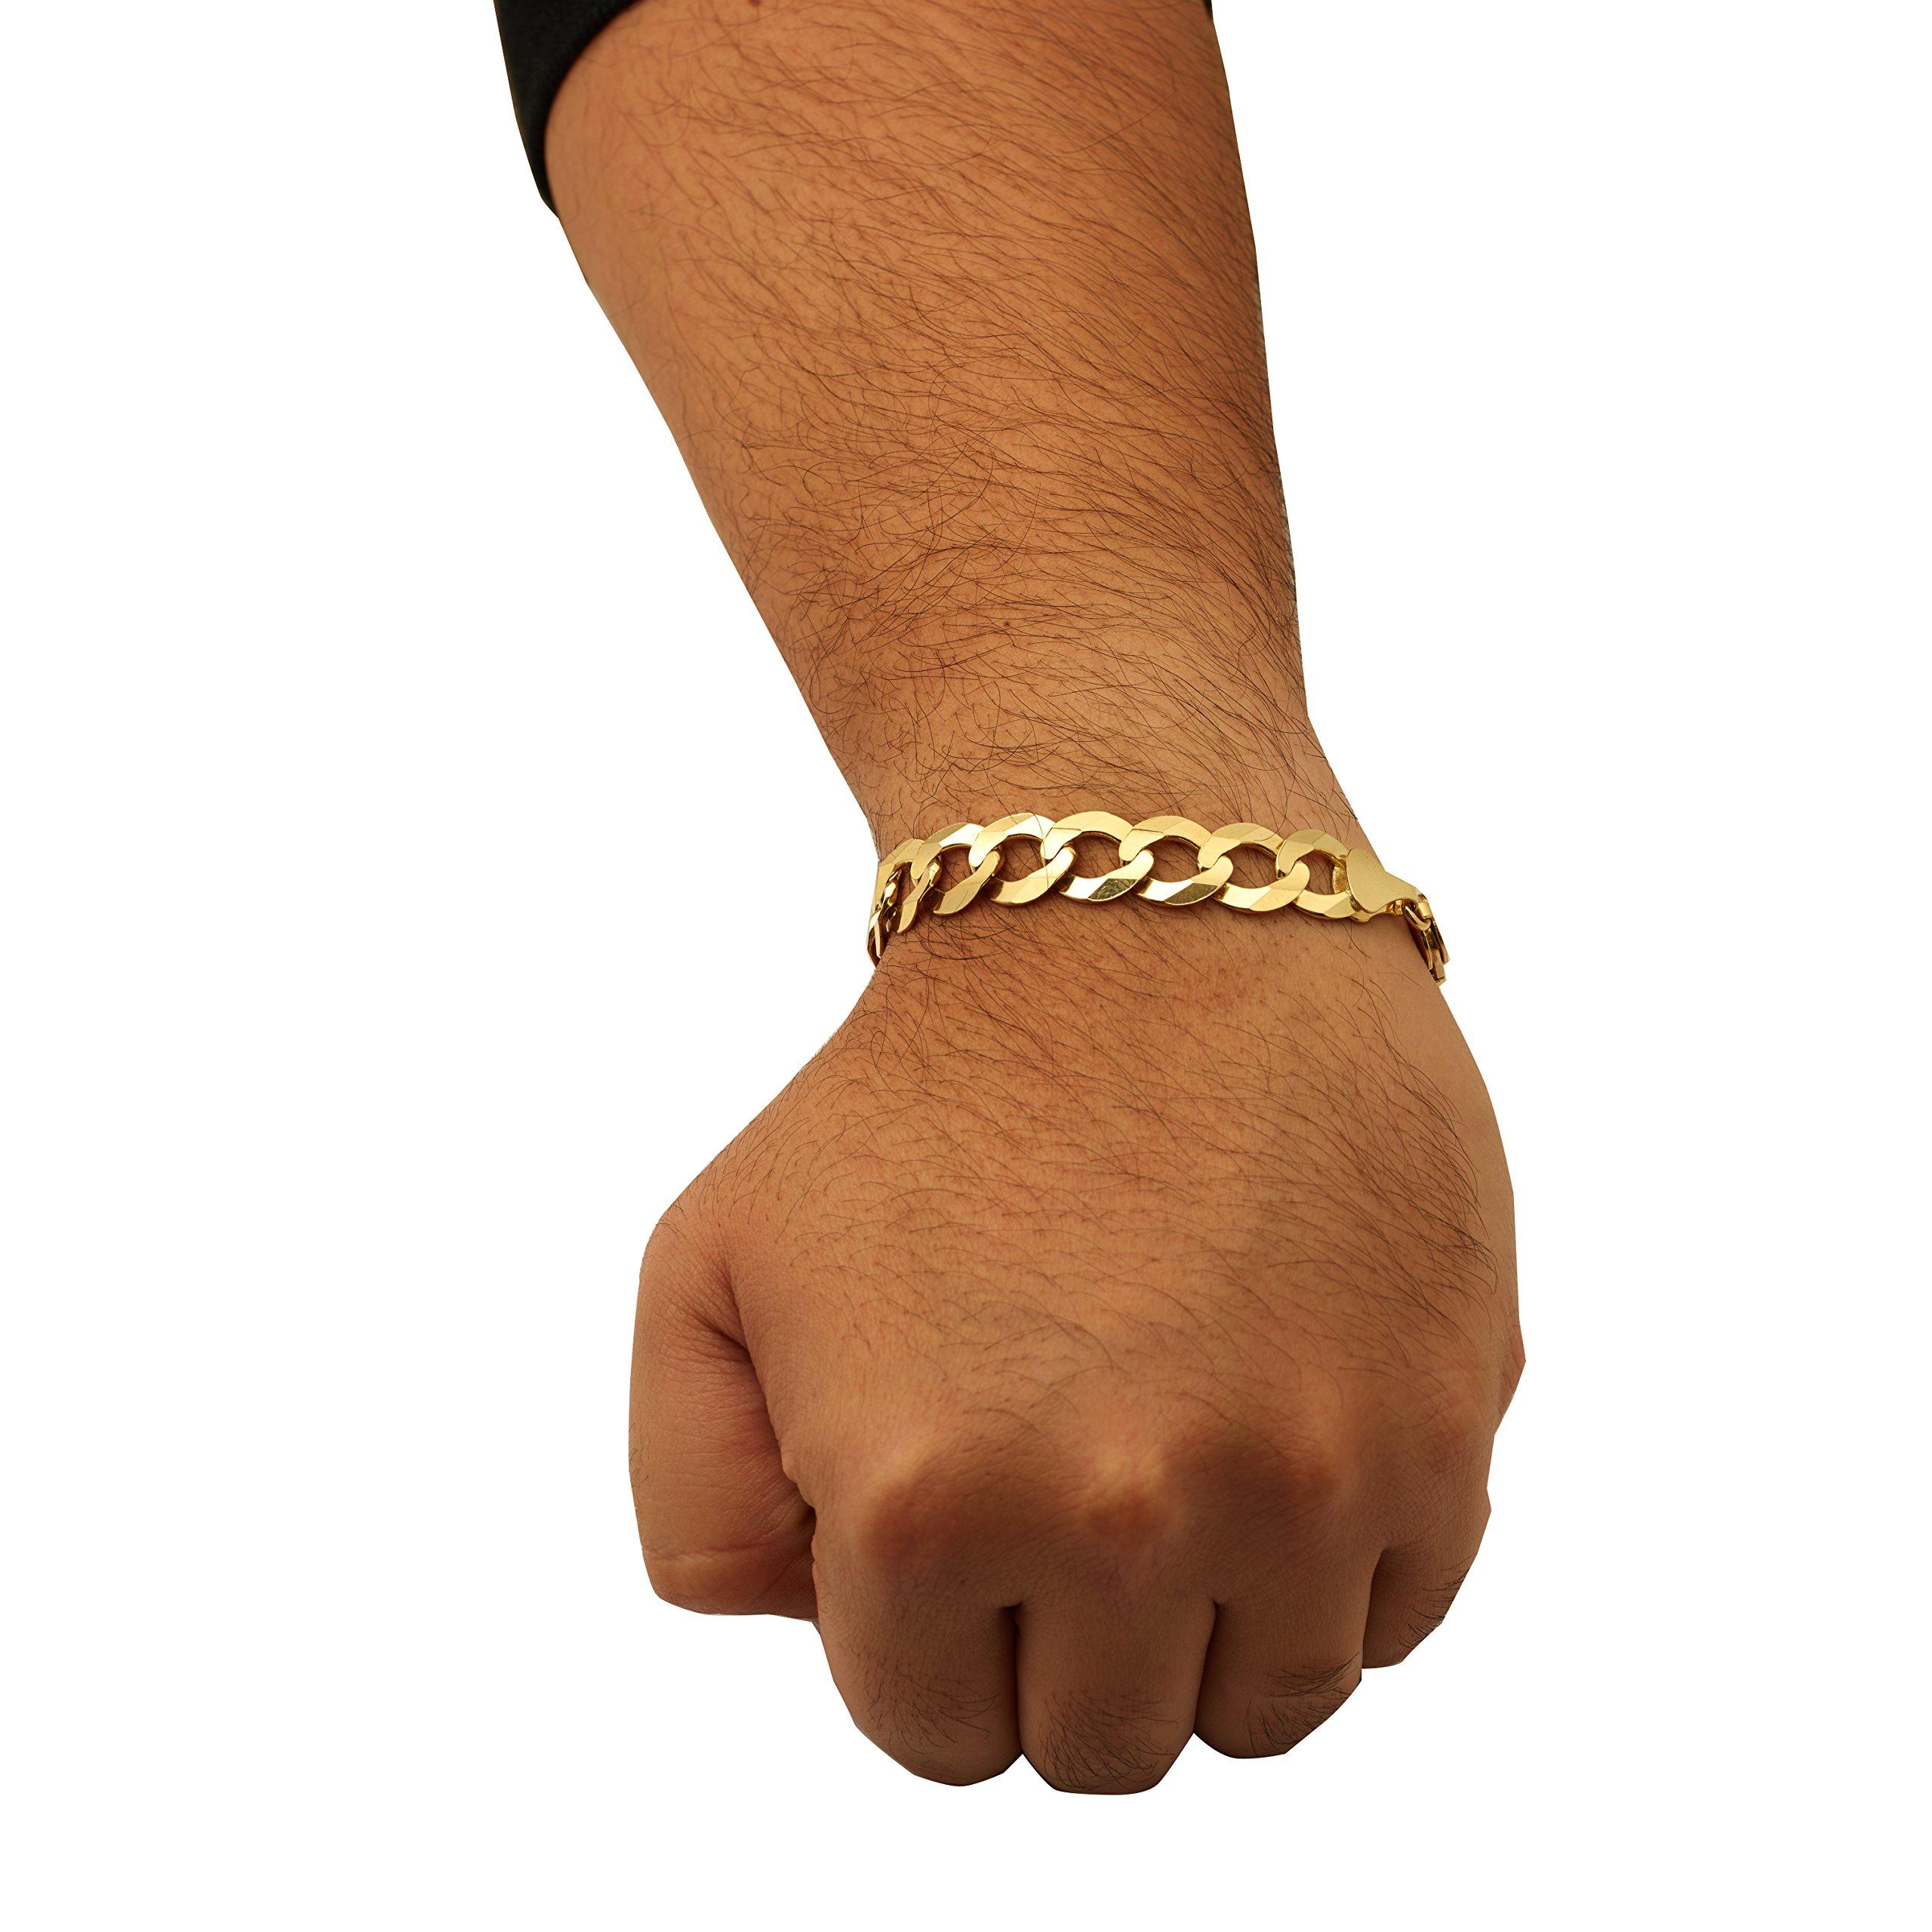 LOVEBLING 10k Yellow Gold 12mm Plain Solid Curb Cuban Bracelet W/Lobster Lock (8'')